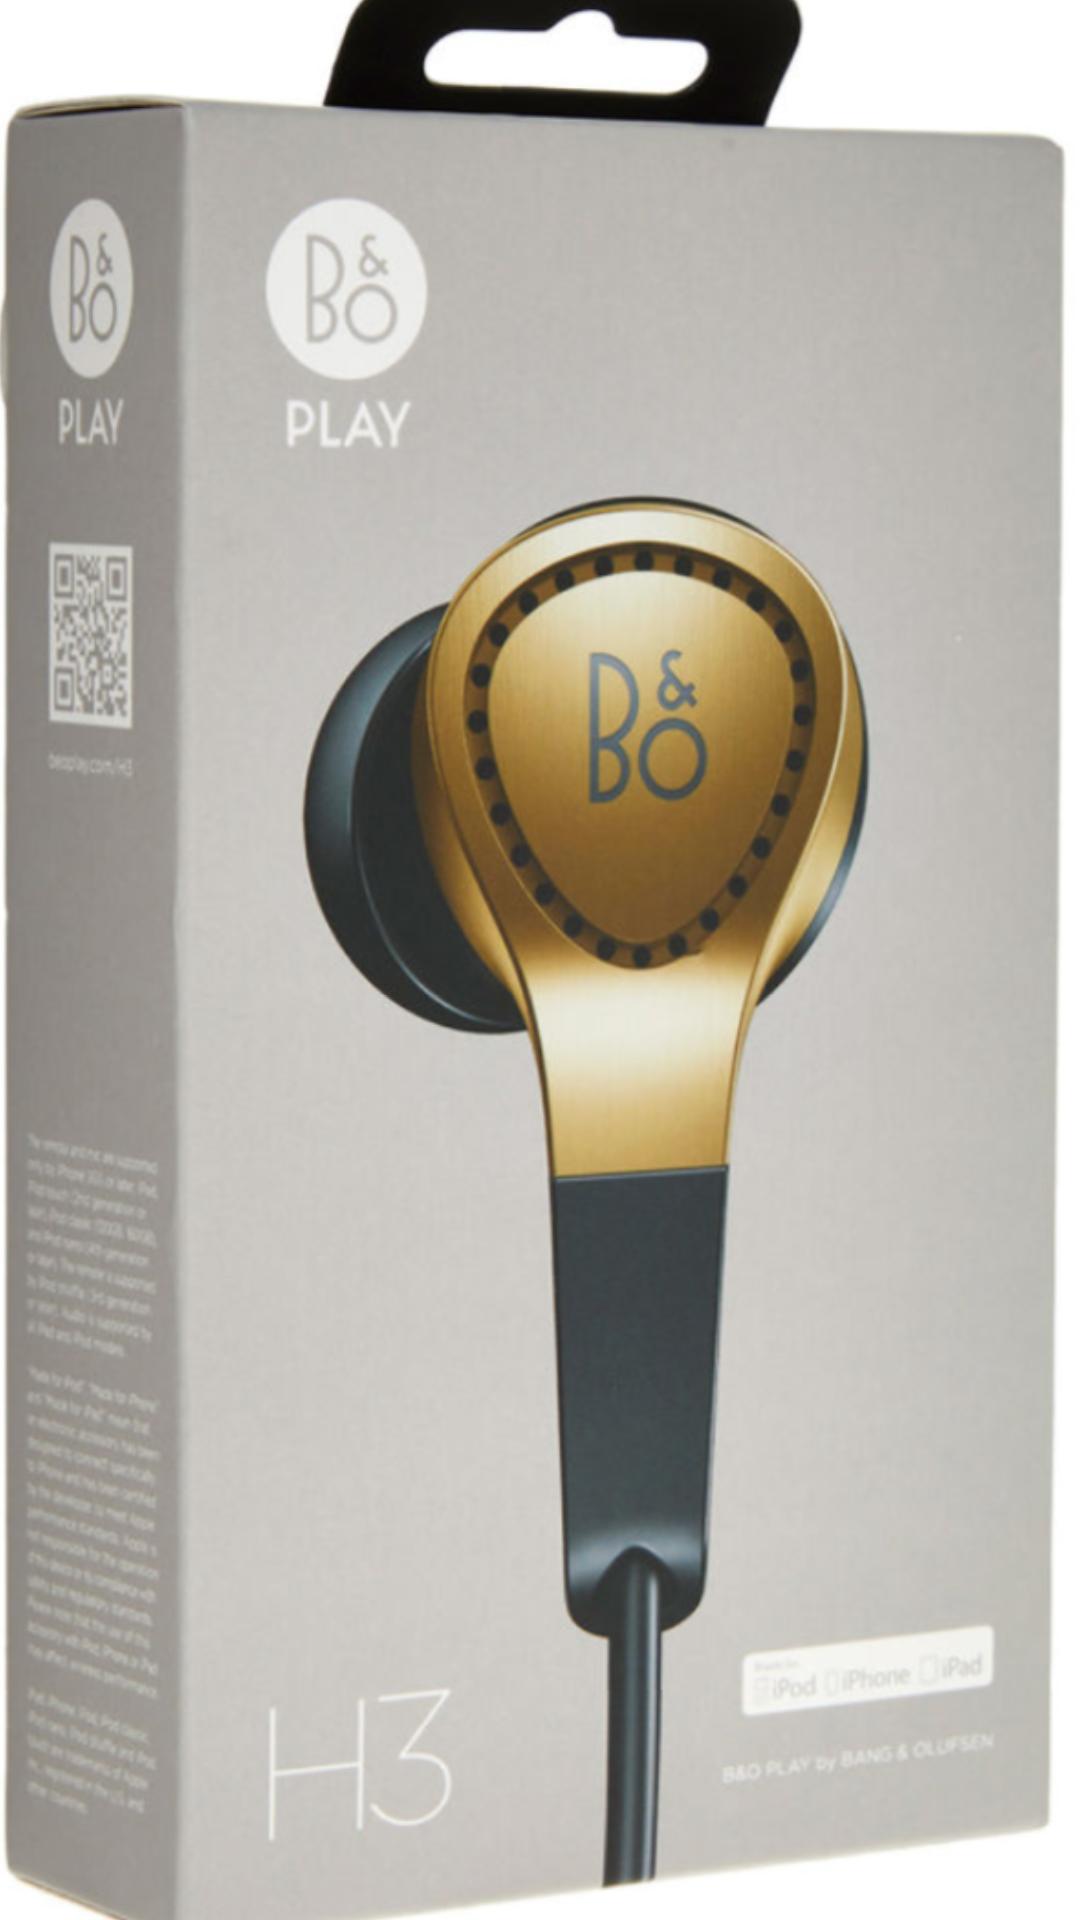 Bang & Olufsen Beoplay H3 Champagne Earphones TK Maxx £69.99 (+3.99 del / £1.99 C&C)